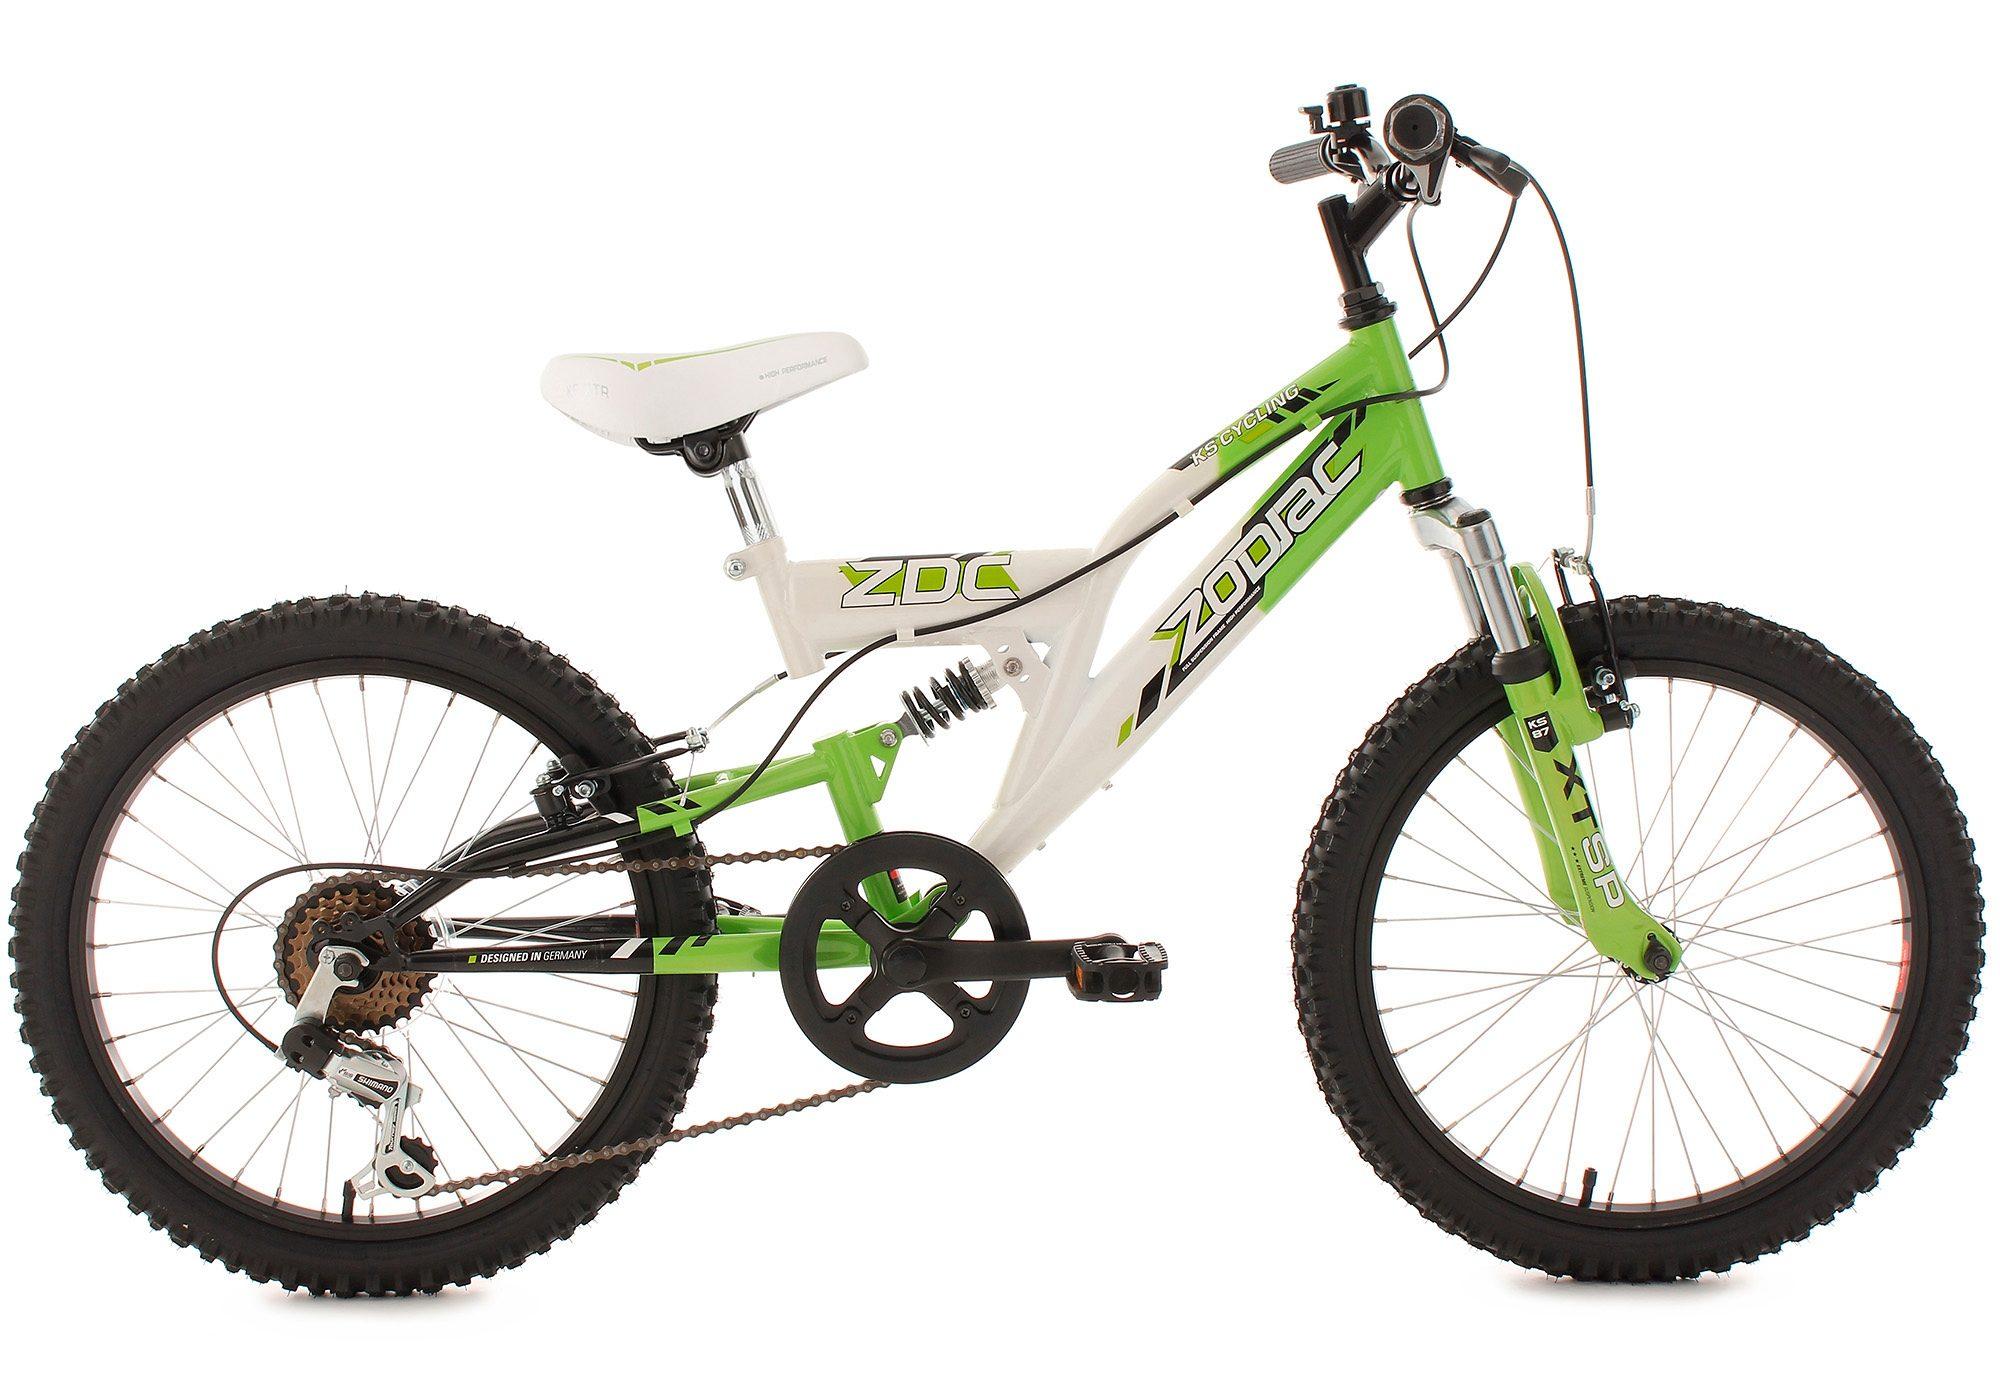 KS Cycling Jugendfahrrad Zodiac, 6 Gang, Shimano, Tourney Schaltwerk, Kettenschaltung grün Kinder Kinderfahrräder Fahrräder Zubehör